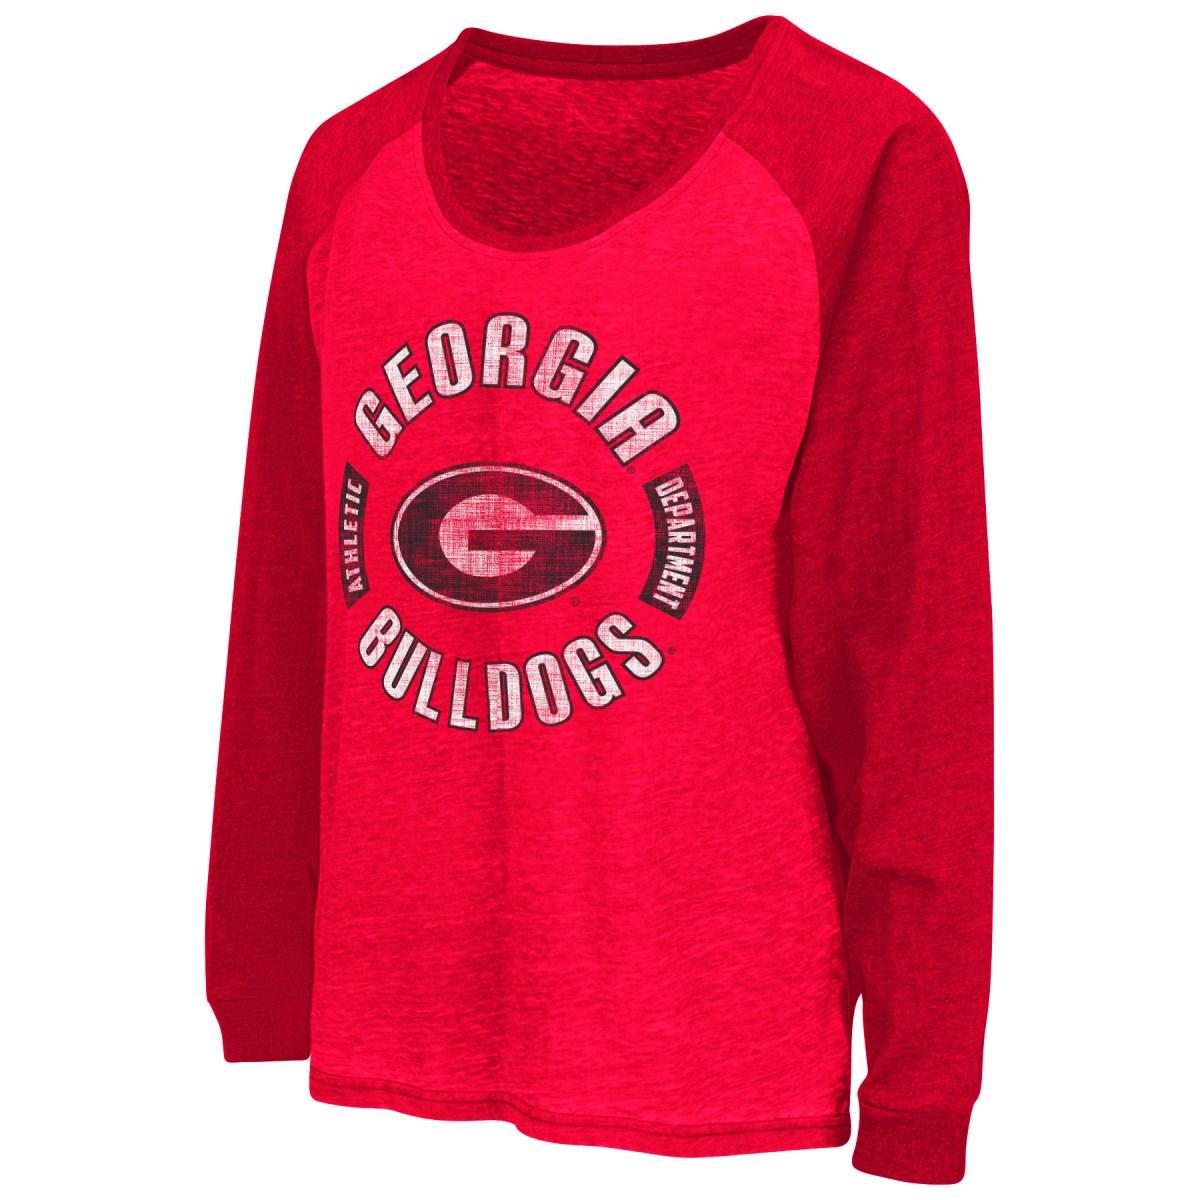 "Georgia Bulldogs Women's NCAA ""Balance"" L/S Banded Bottom Top Shirt"